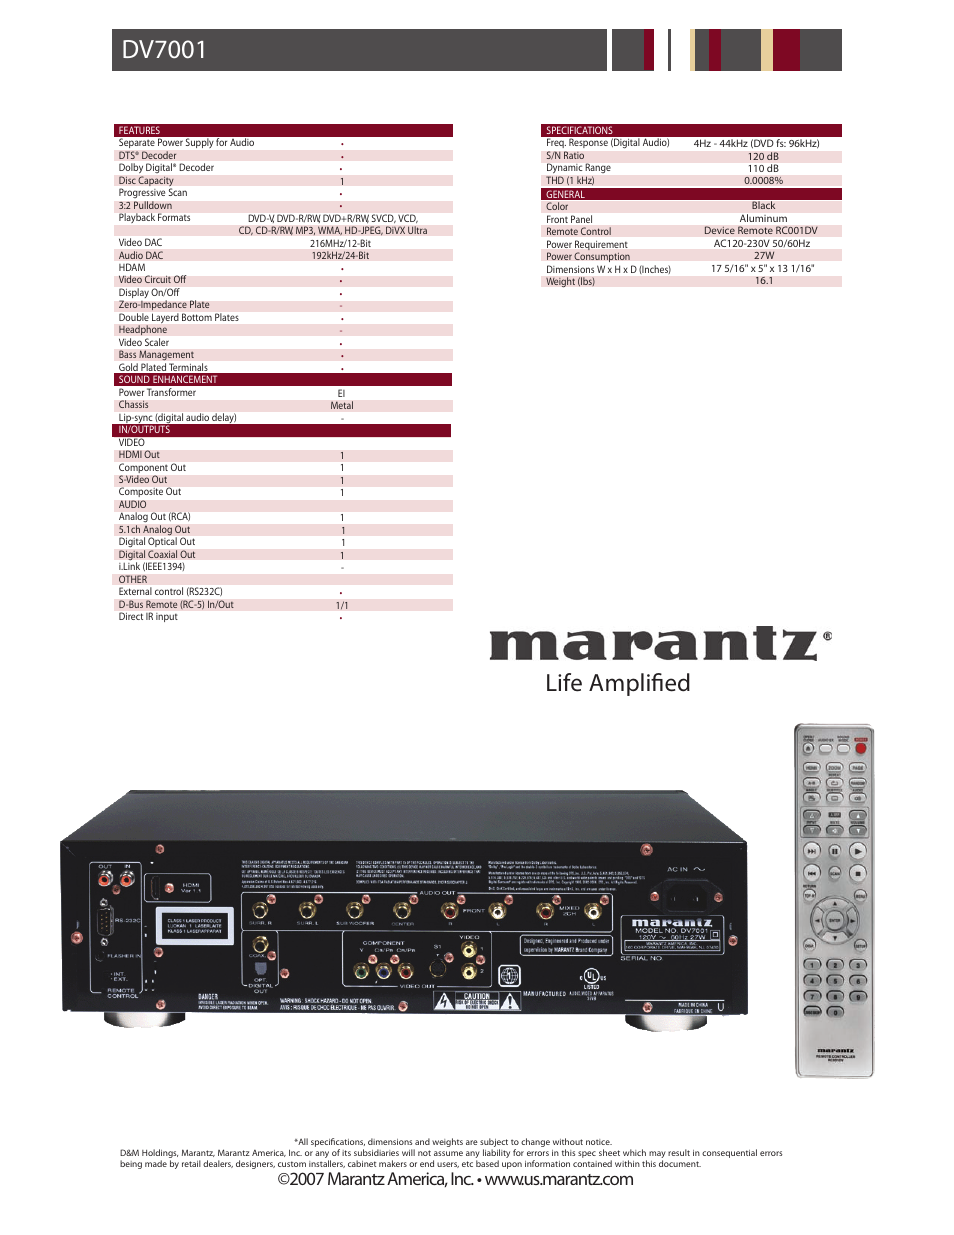 dv7001 p2 dv7001 life amplified marantz dv7001 user manual rh manualsdir com Kindle Fire User Guide Kindle Fire User Guide